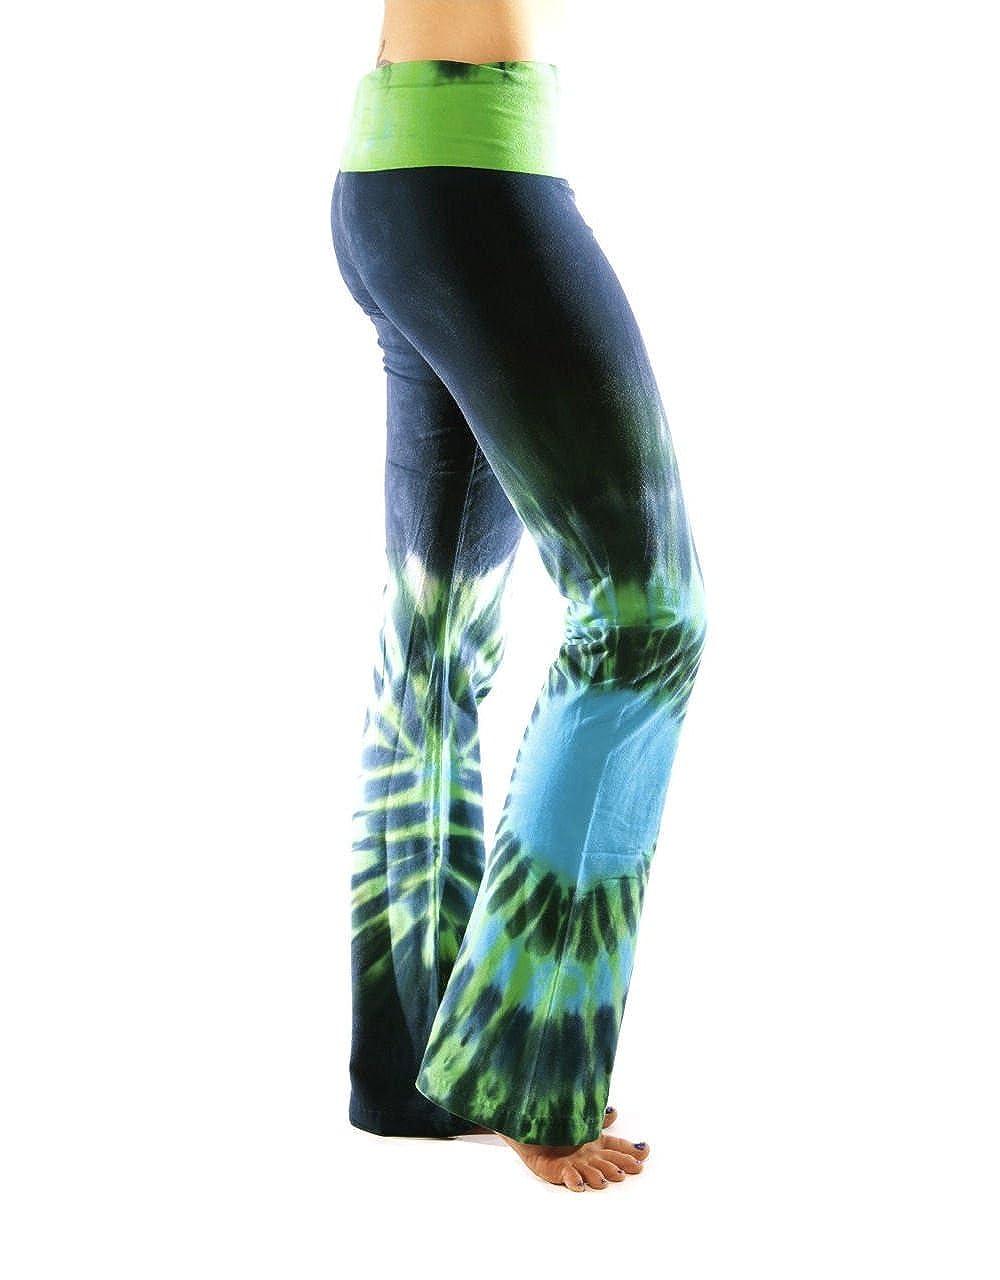 511cc2b5349a5 Amazon.com: Shining Shakti Boundless Tie-Dyed Yoga Pants - Large ...